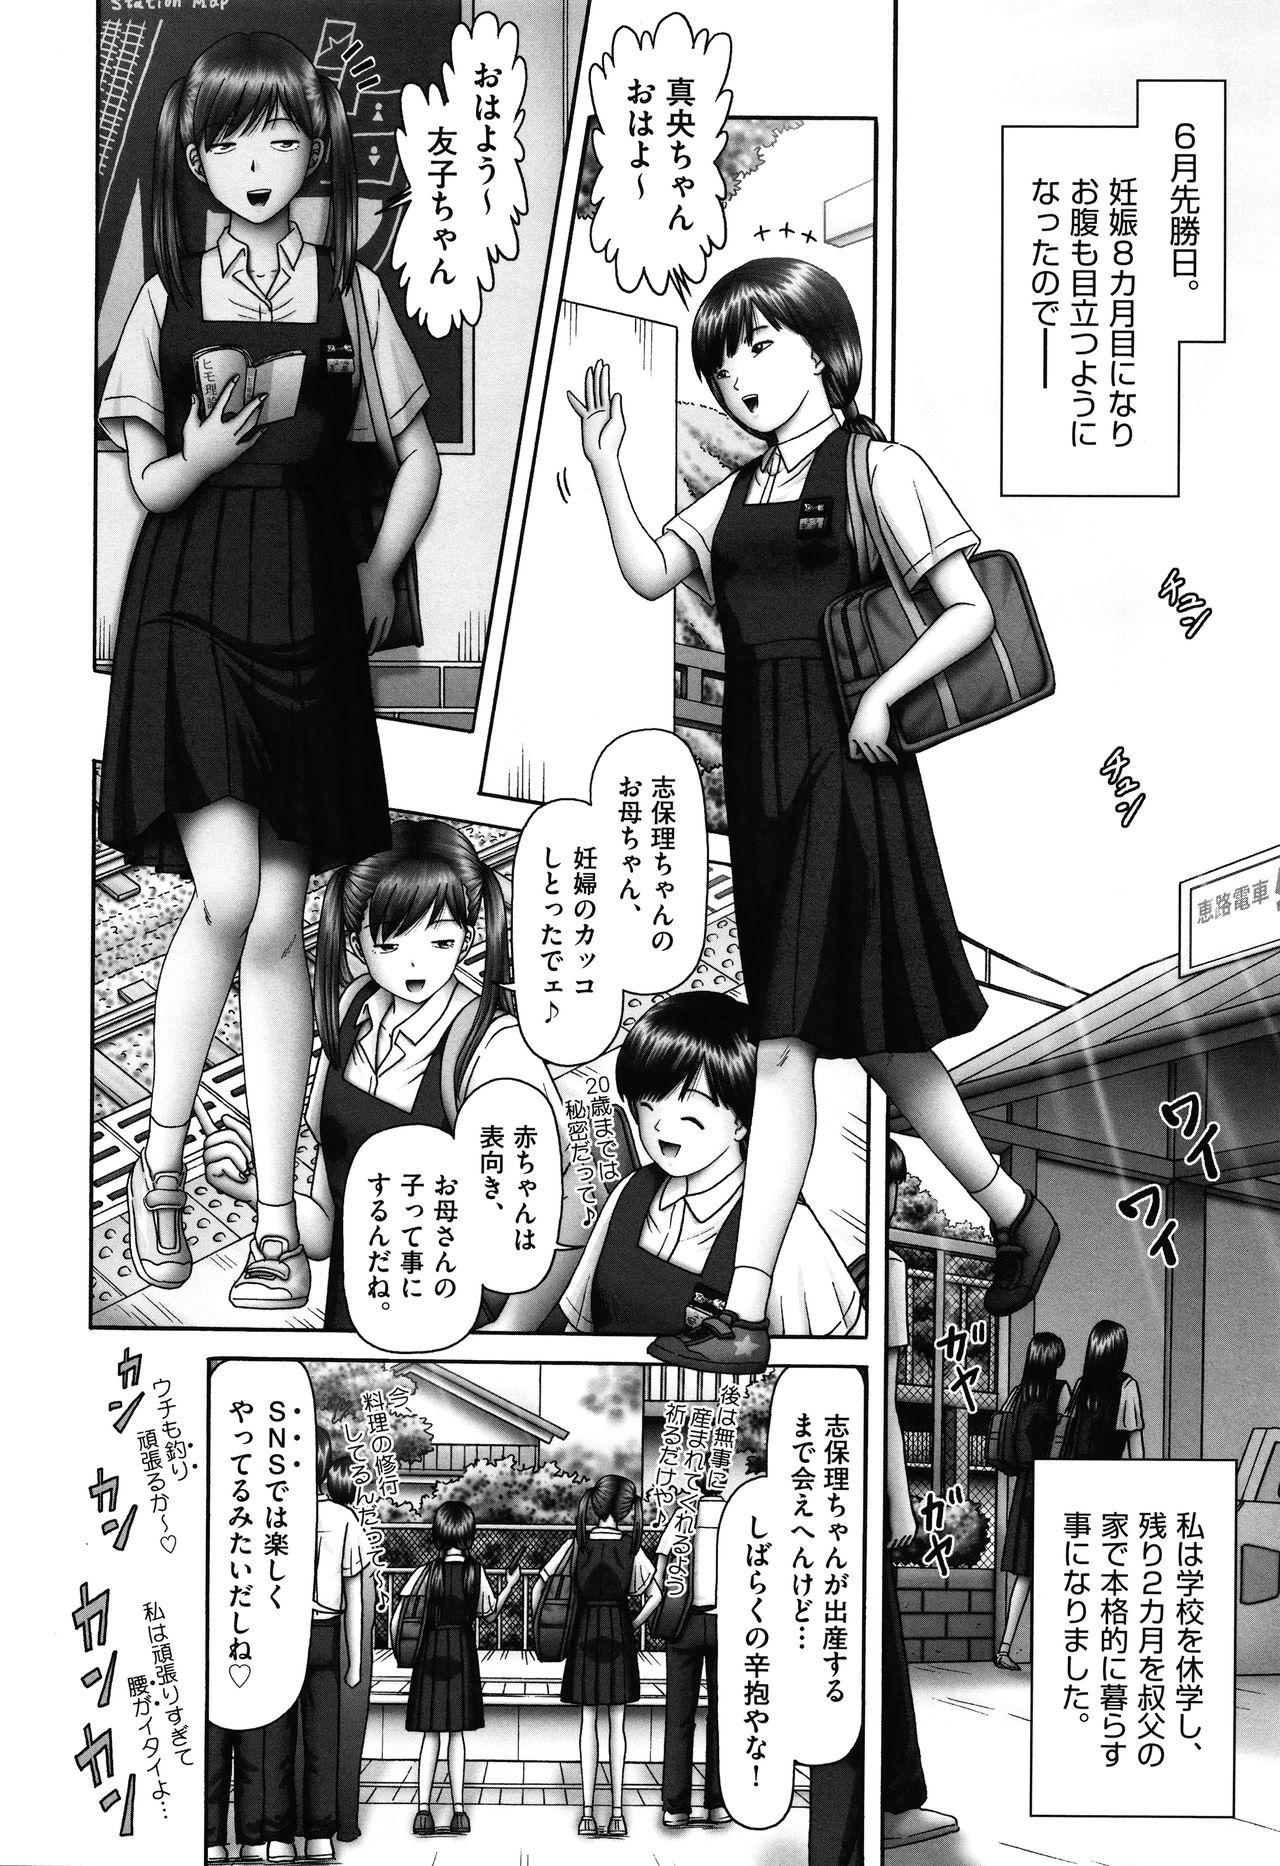 Shoujo Kumikyoku 17 28